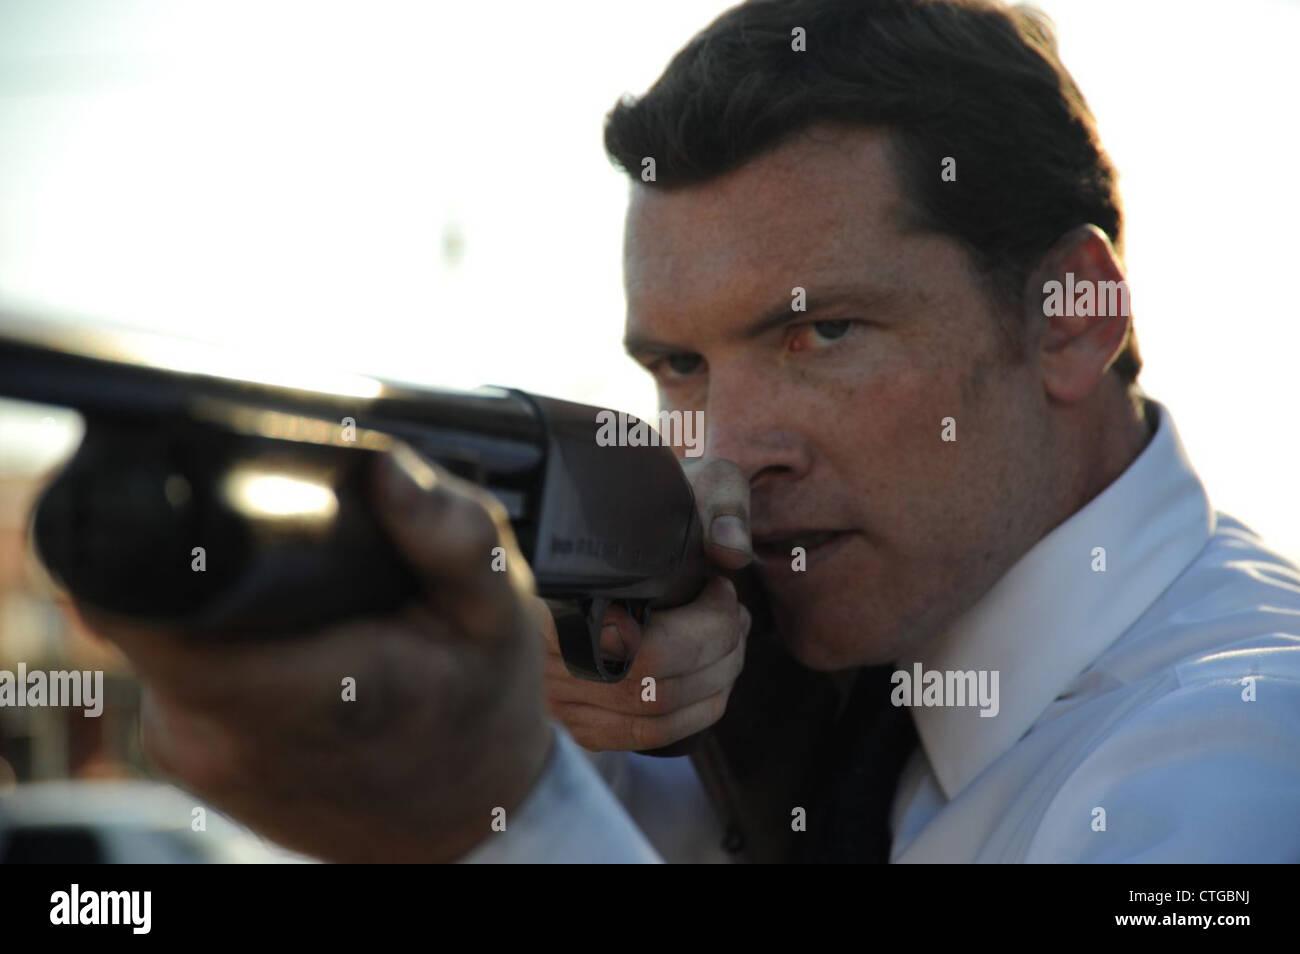 TEXAS Killing Fields (2011) Sam Worthington, AMI CANAAN MANN (DIR) 003 COLLECTION MOVIESTORE LTD Photo Stock